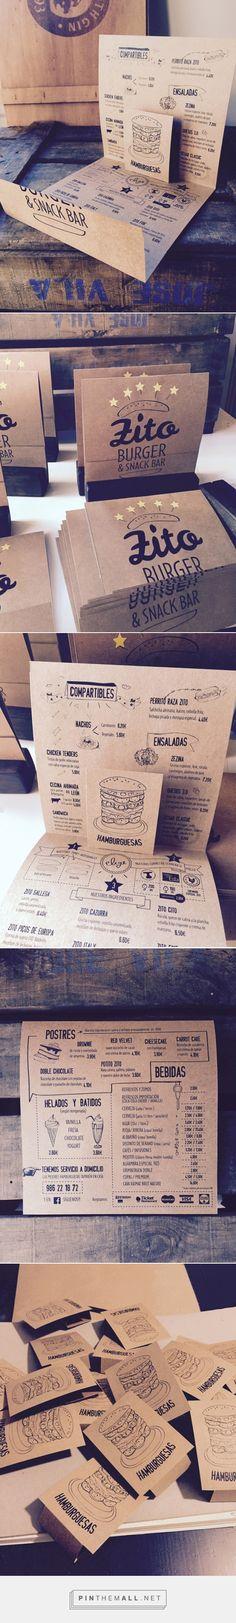 Art of the Menu: Zito Burger